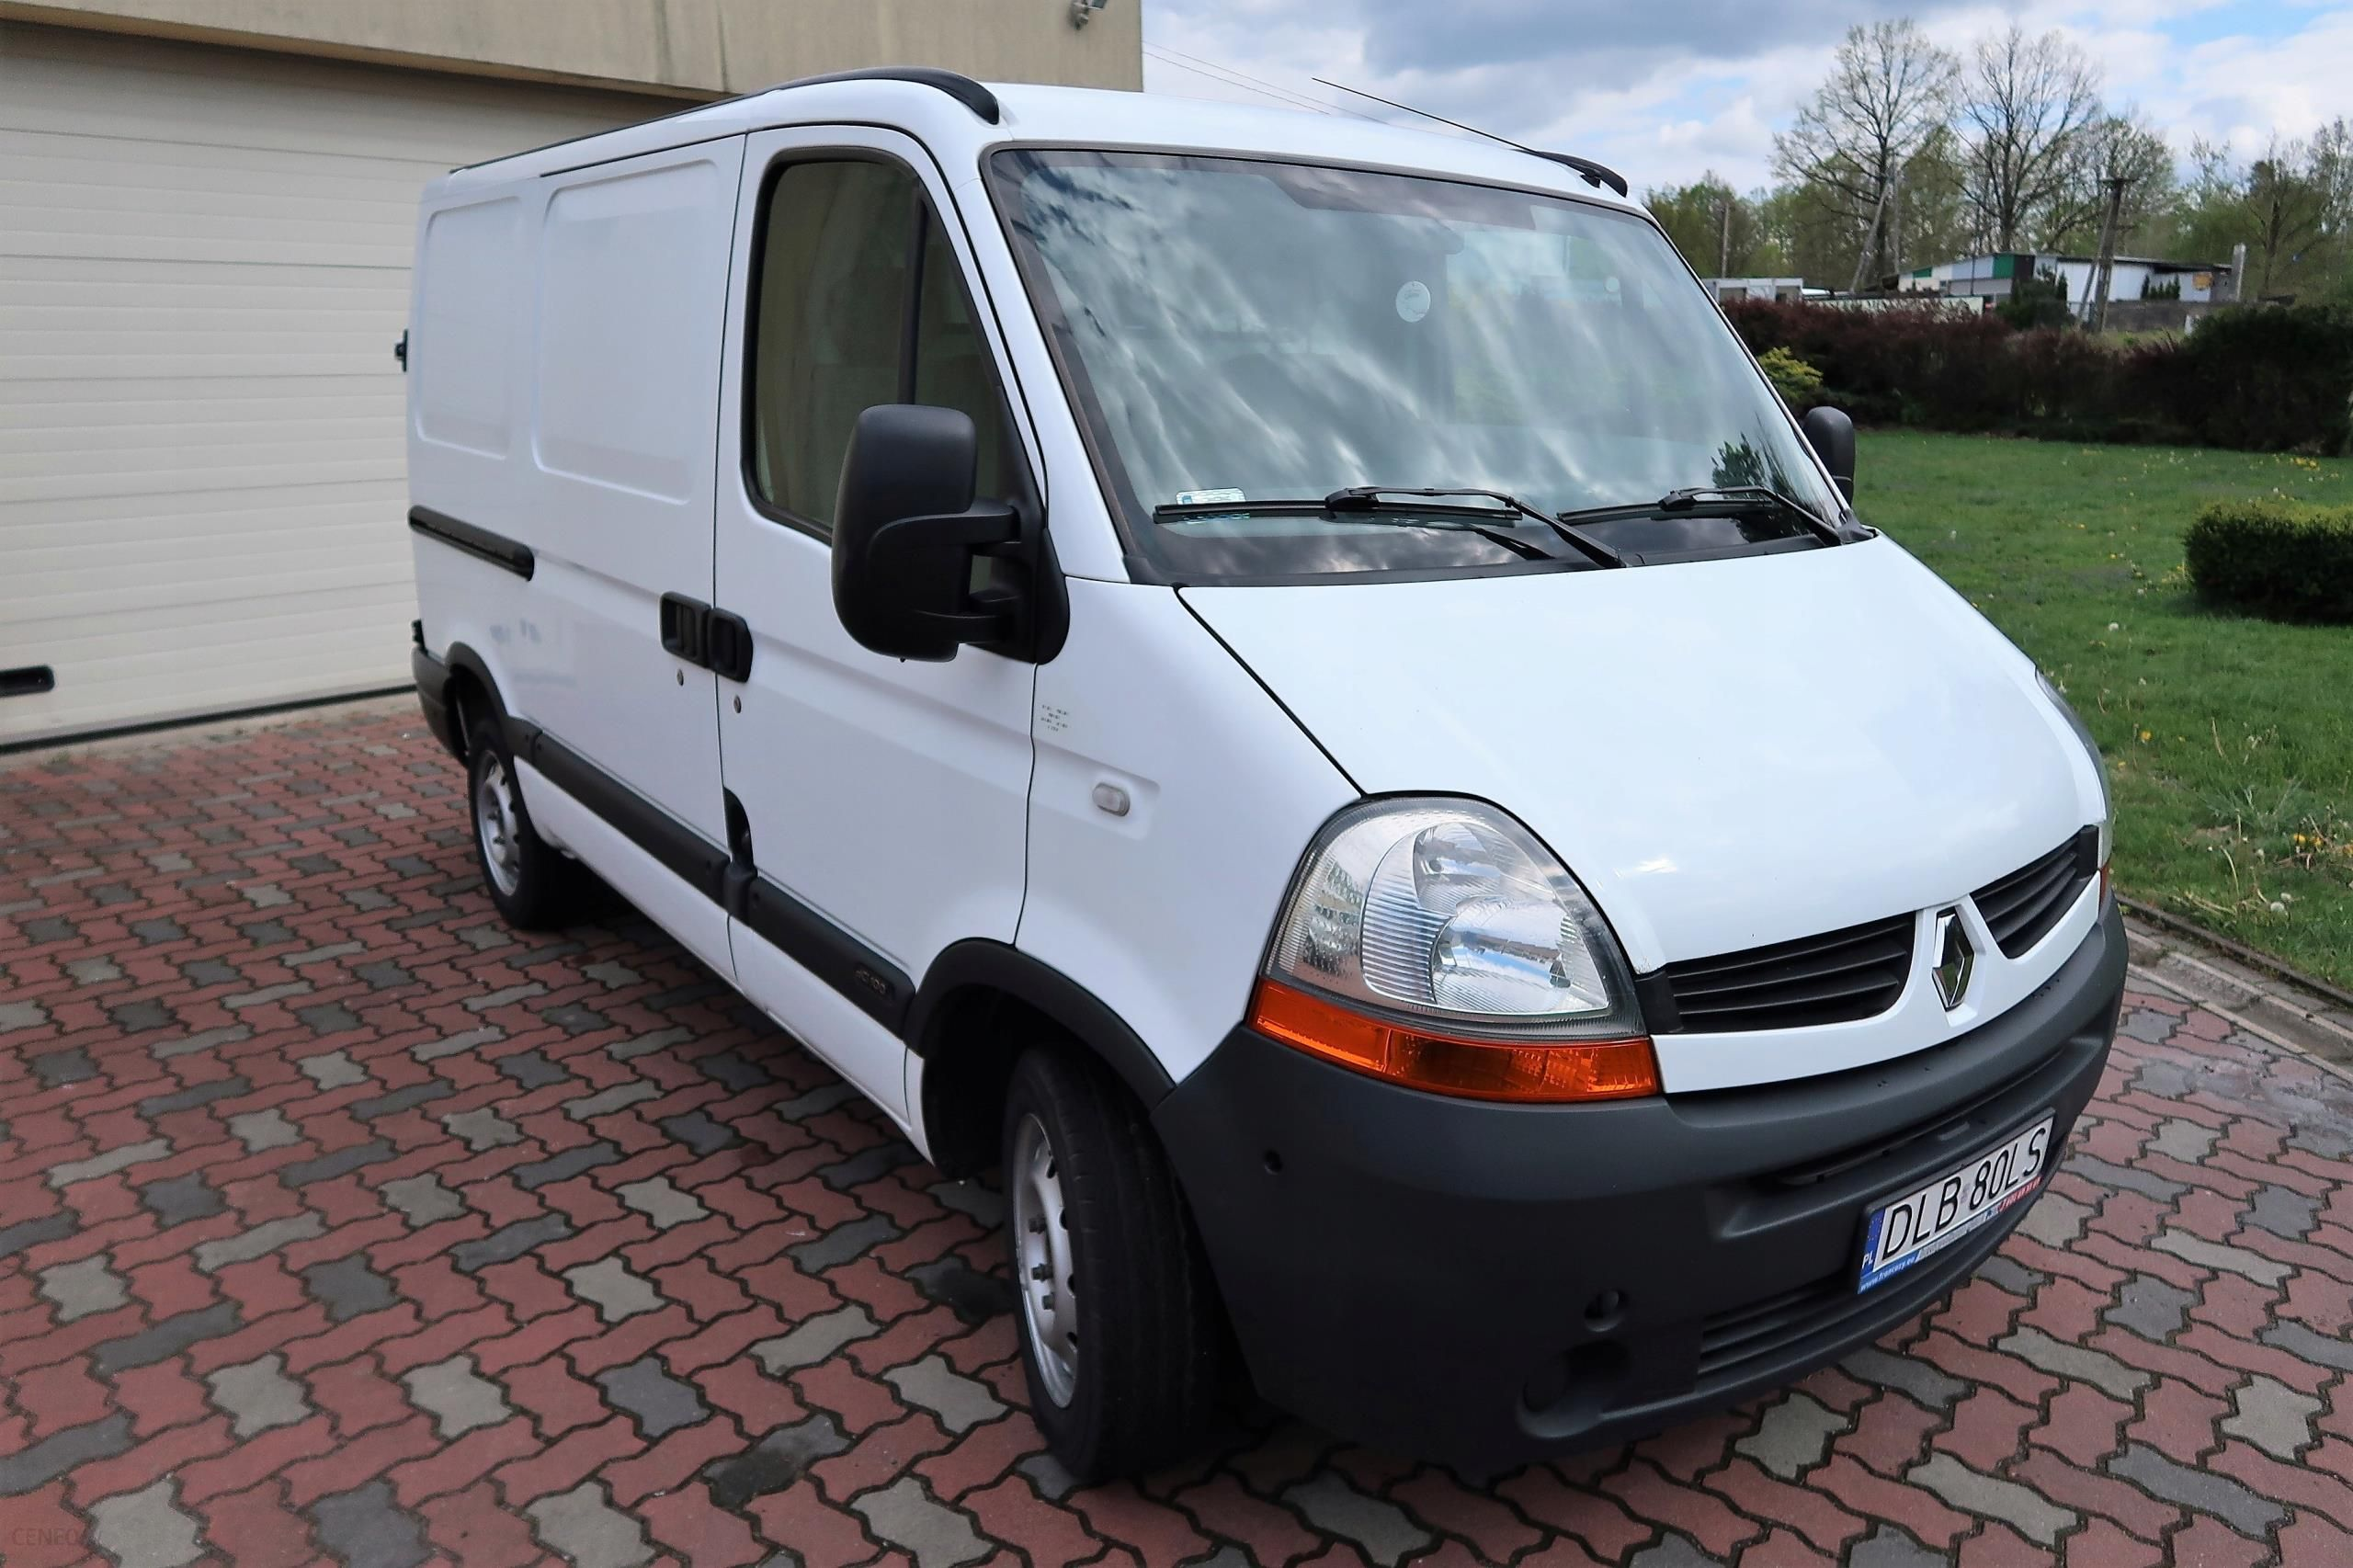 Renault Master L1h1 Bus Dostawcze Faktura Vat 23 Opinie I Ceny Na Ceneo Pl